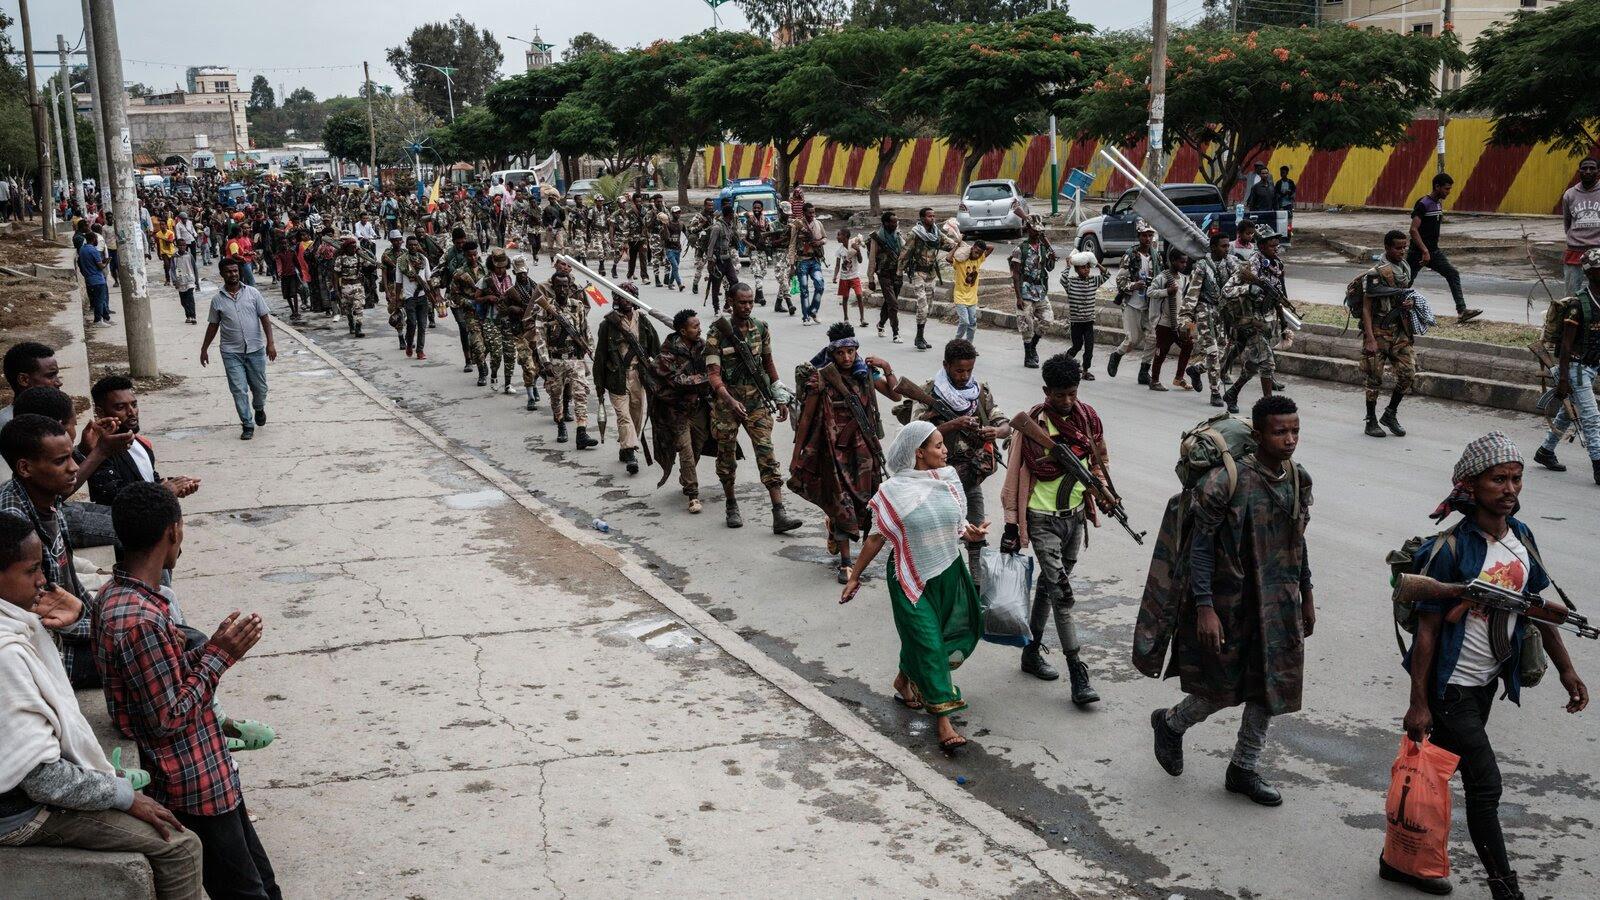 Biden to Meet With Kenya's President Amid Crisis in Ethiopia